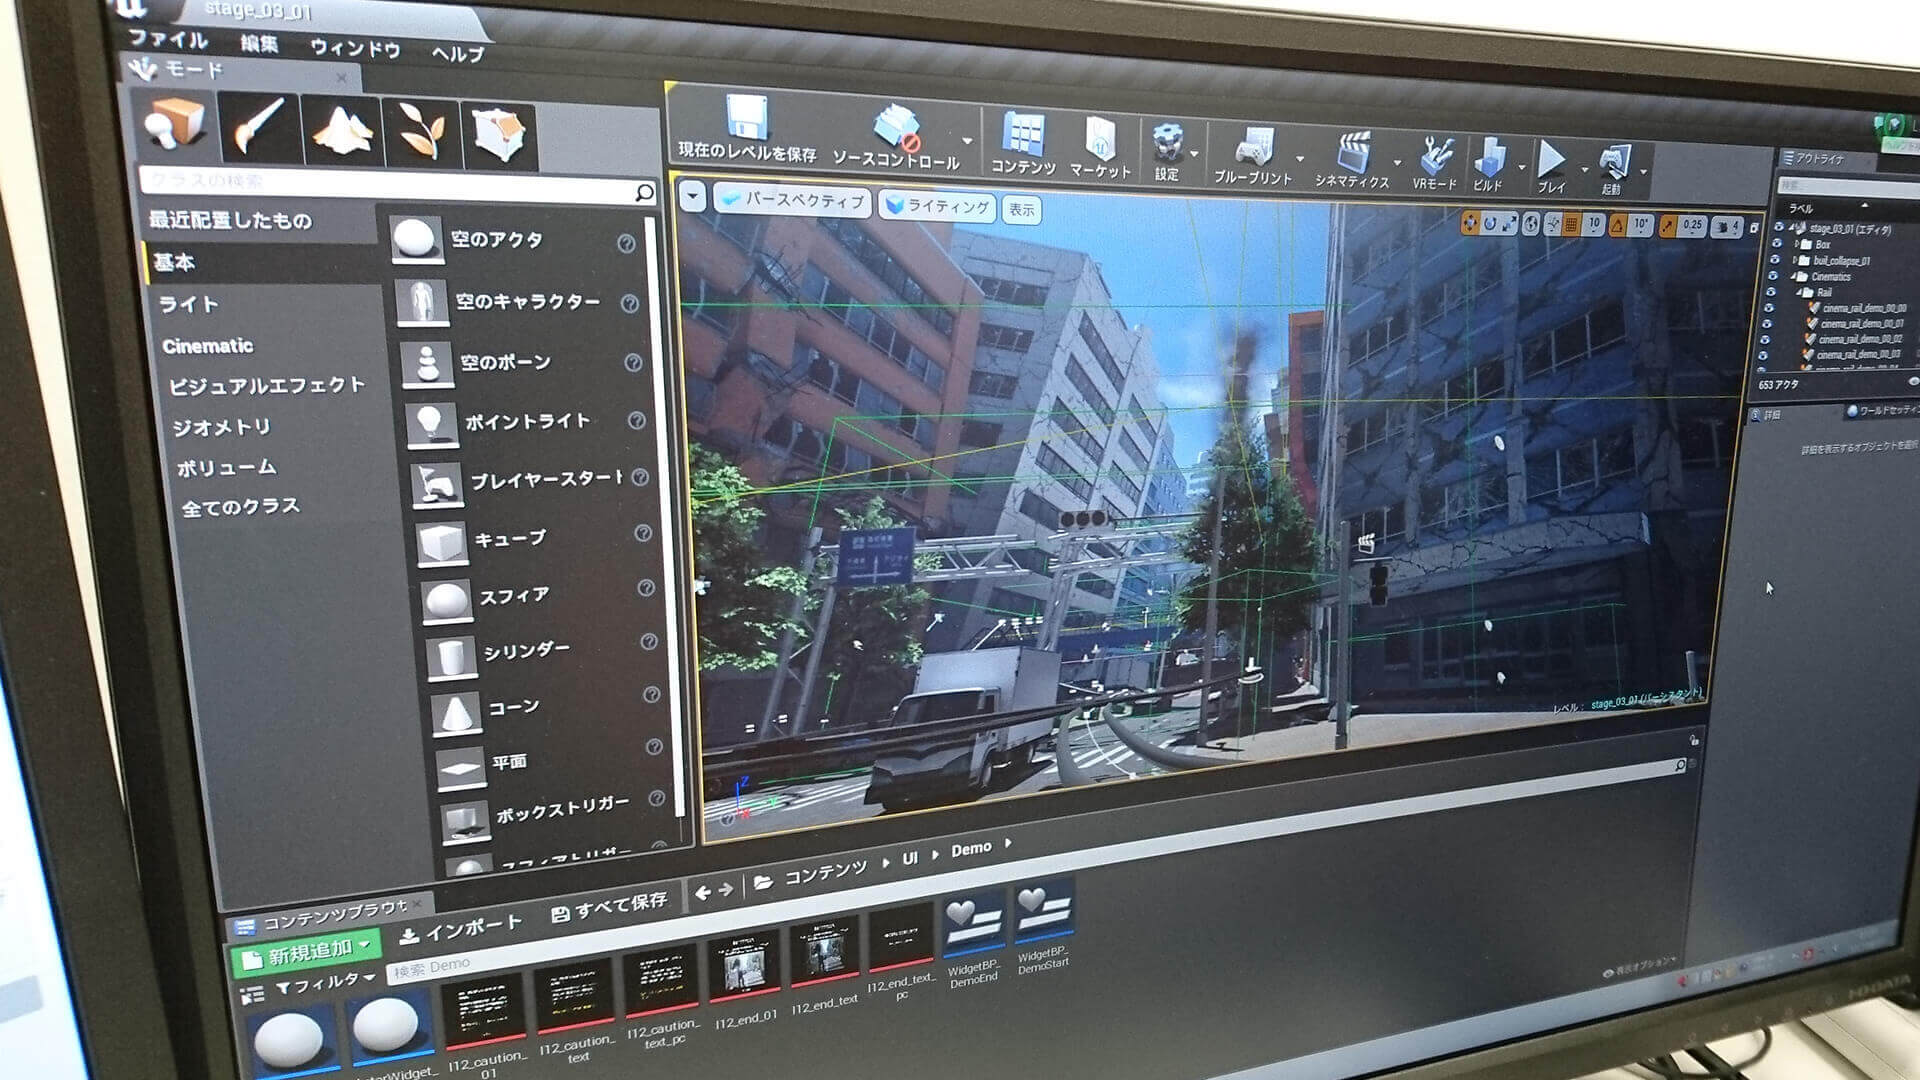 絶体絶命都市シリーズ最新作の開発画面